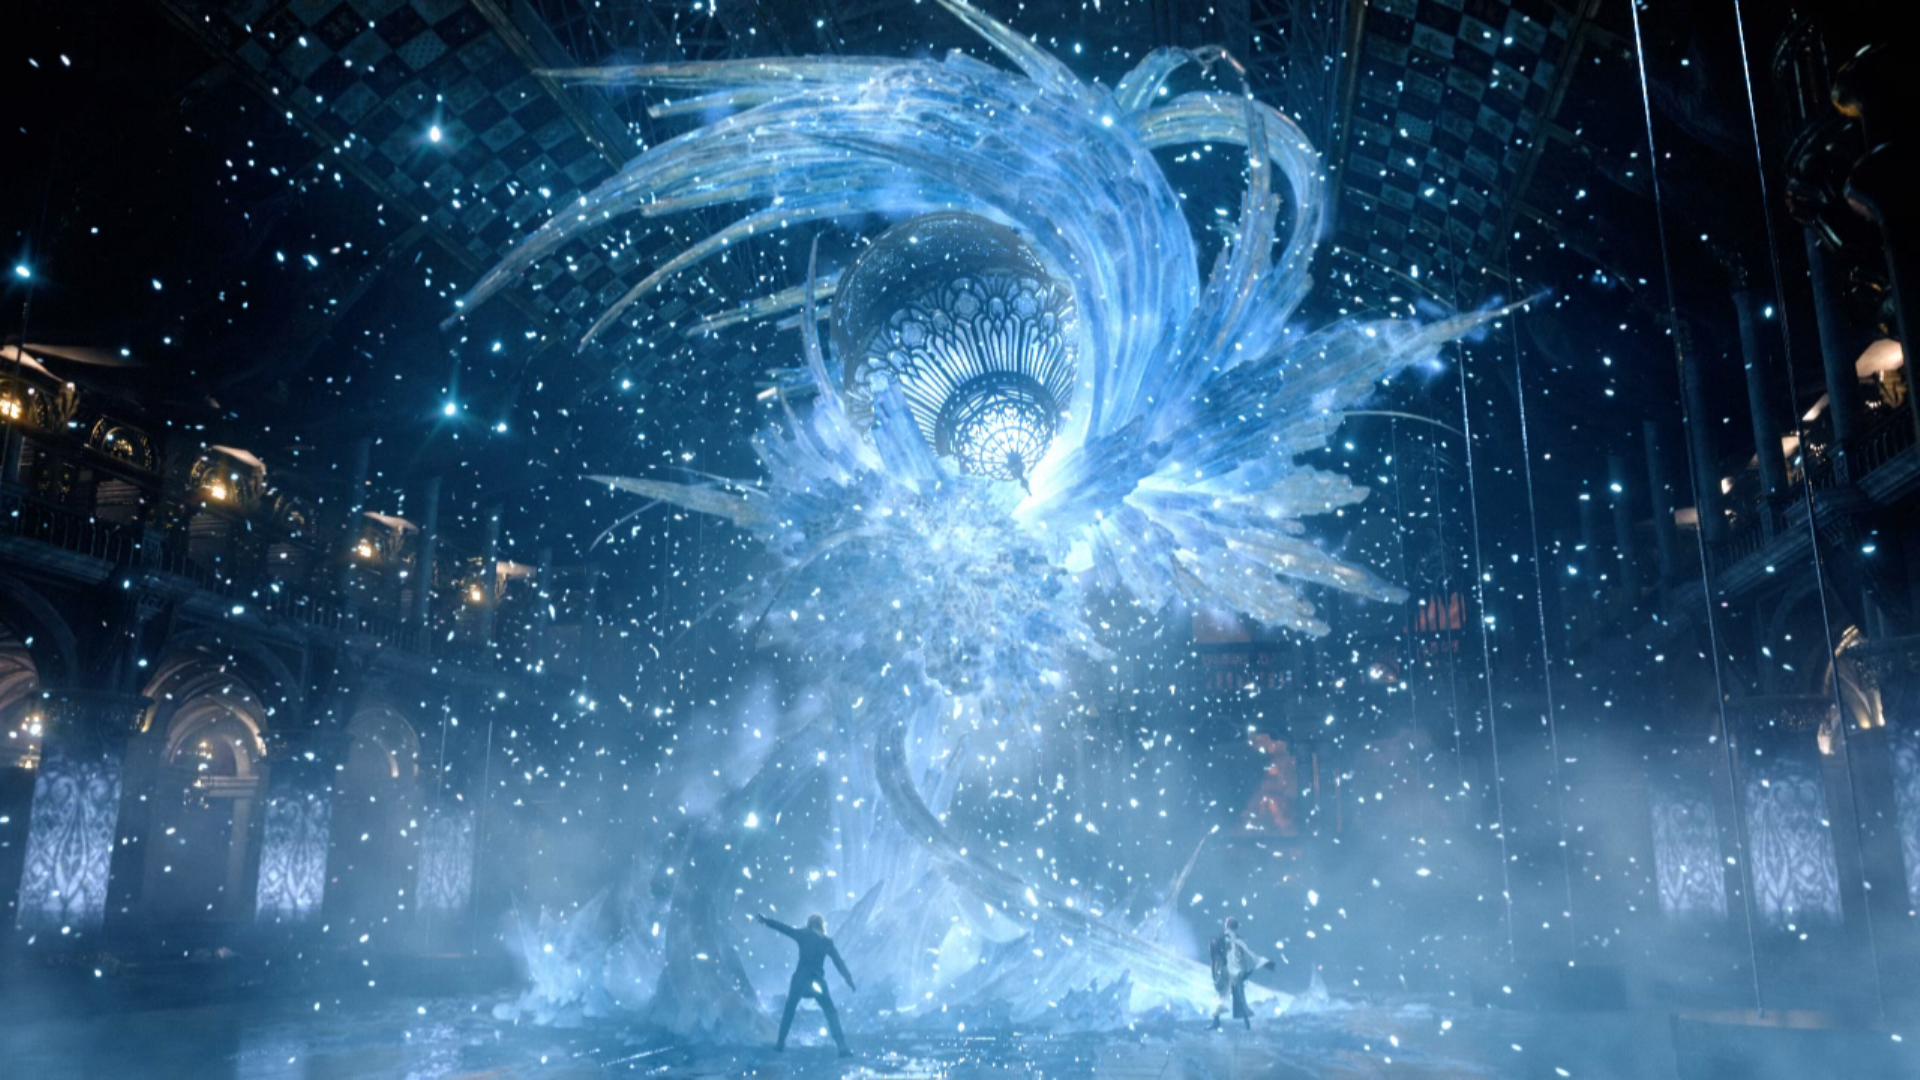 Snow 39 S Crystal Pillar Final Fantasy Pinterest Final